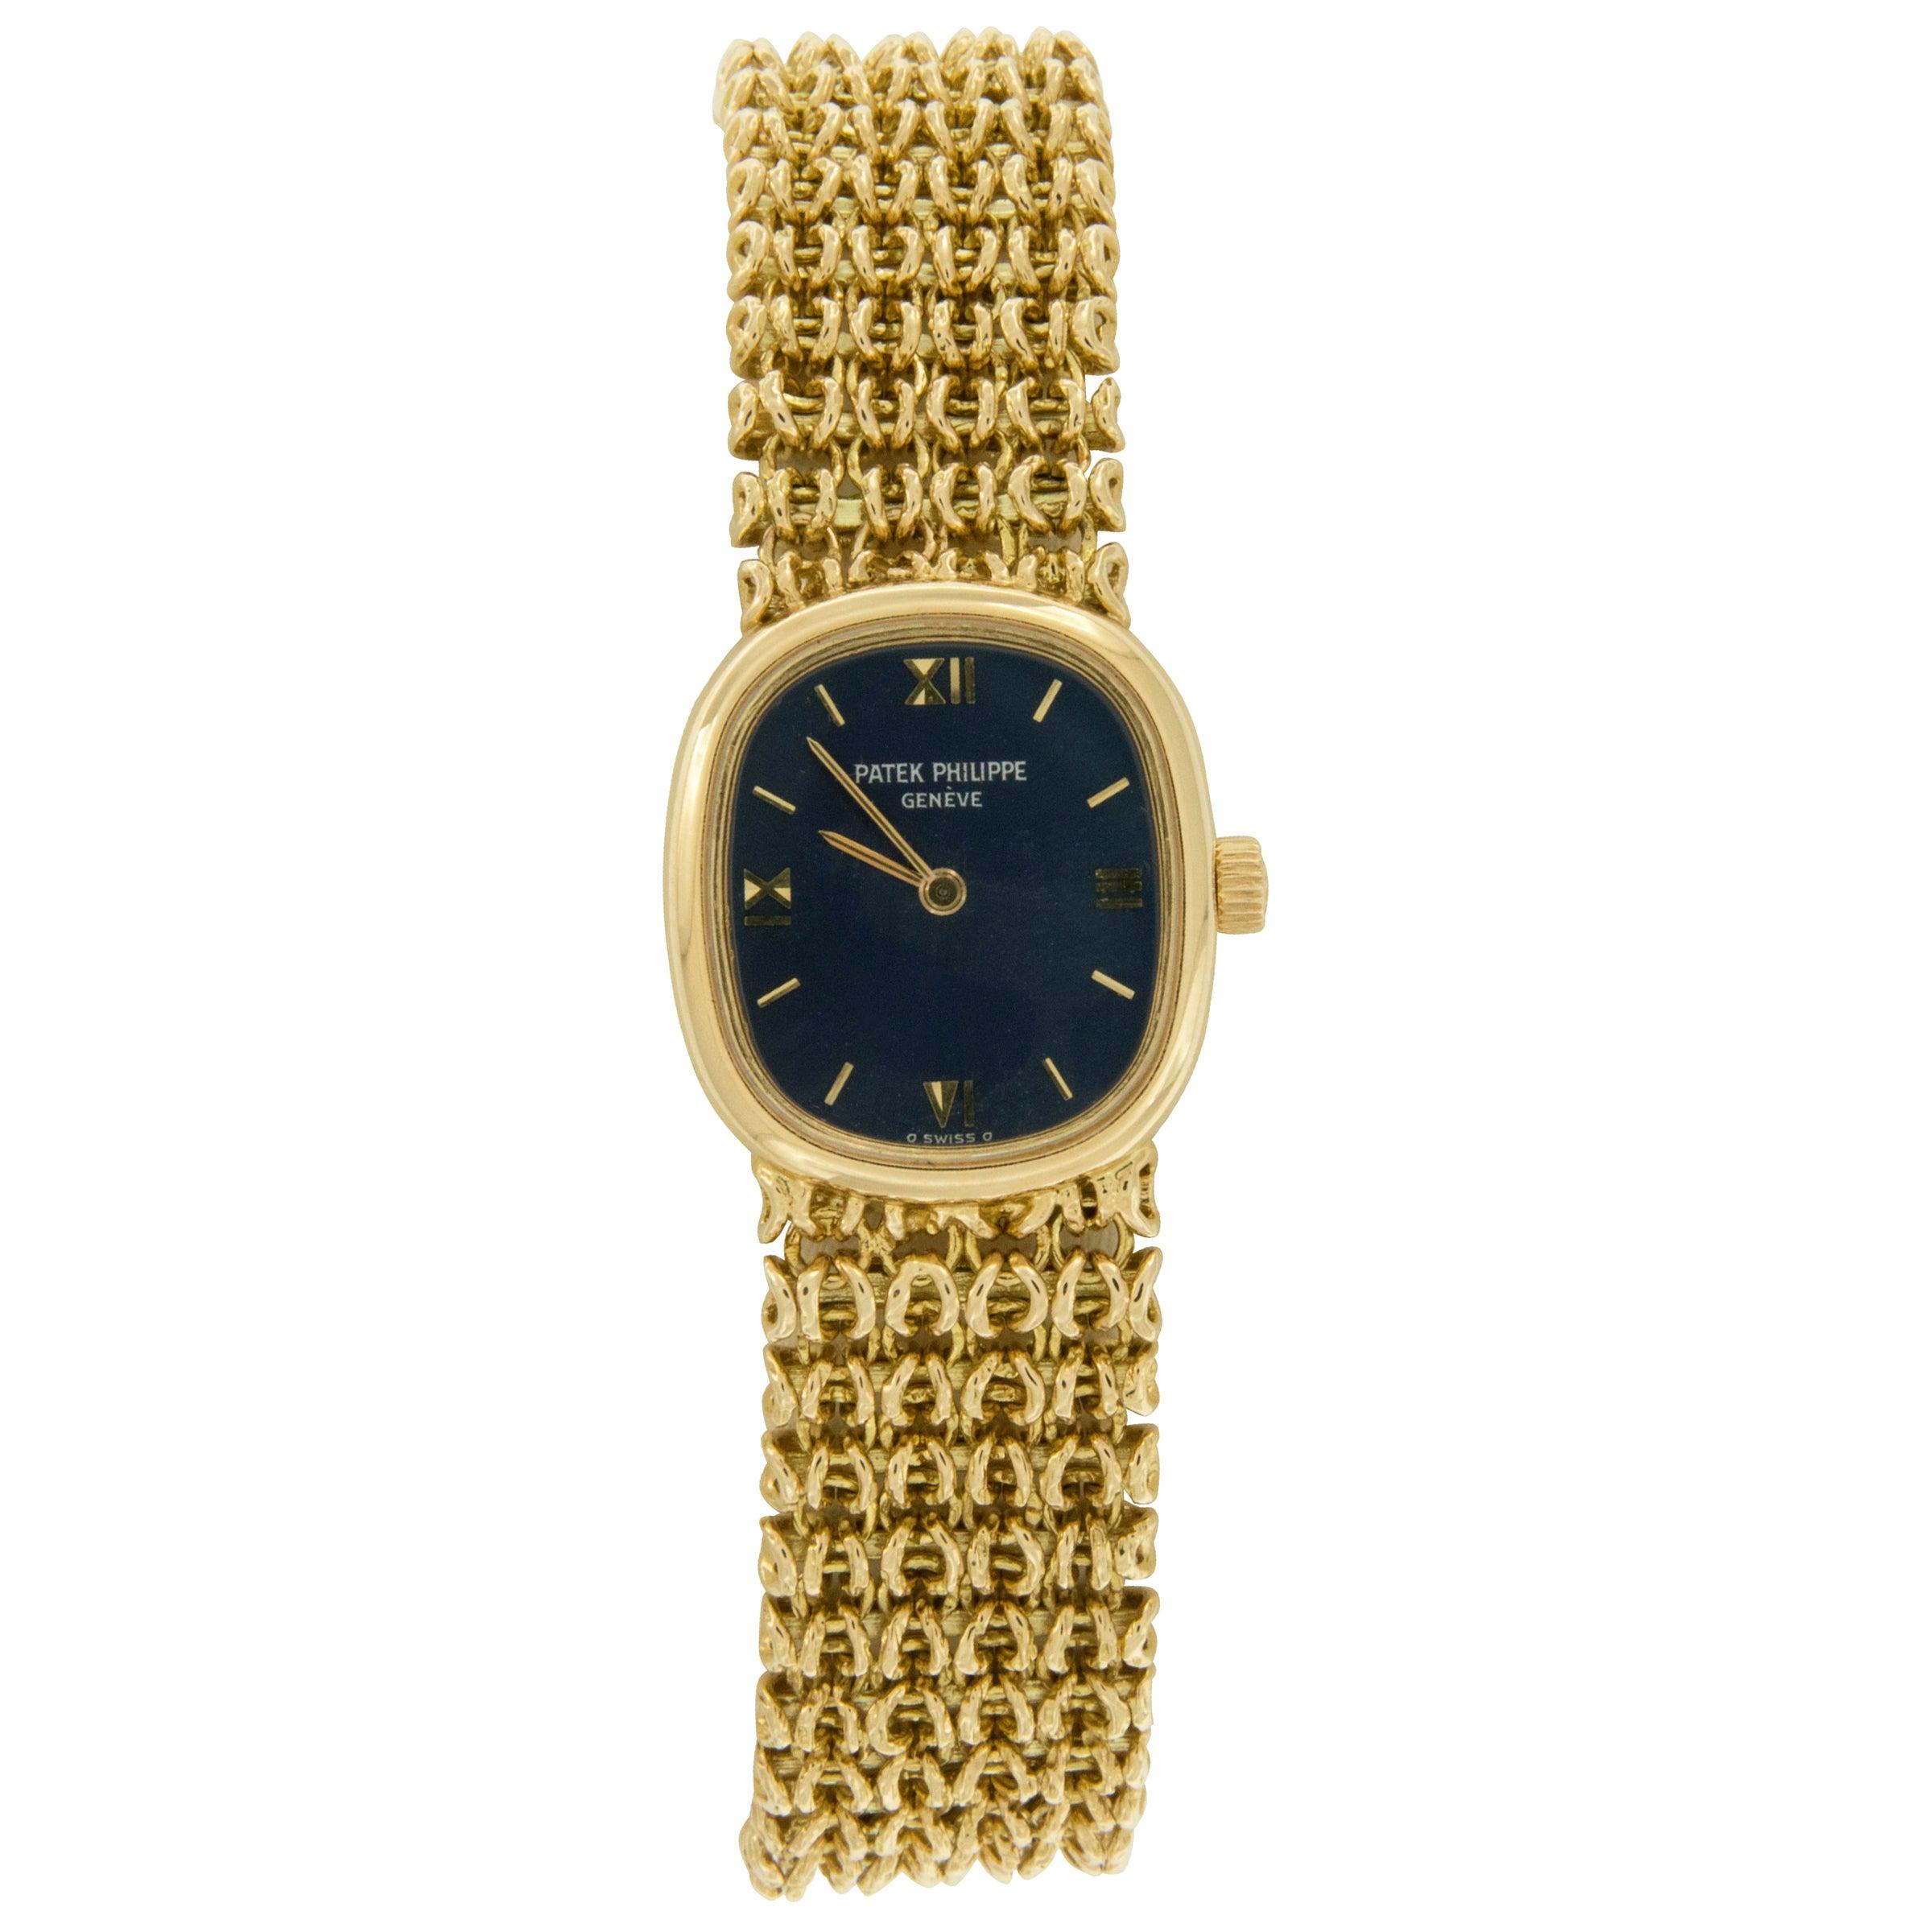 18 Karat Yellow Gold Patek Philippe Golden Ellipse Mechanical Watch